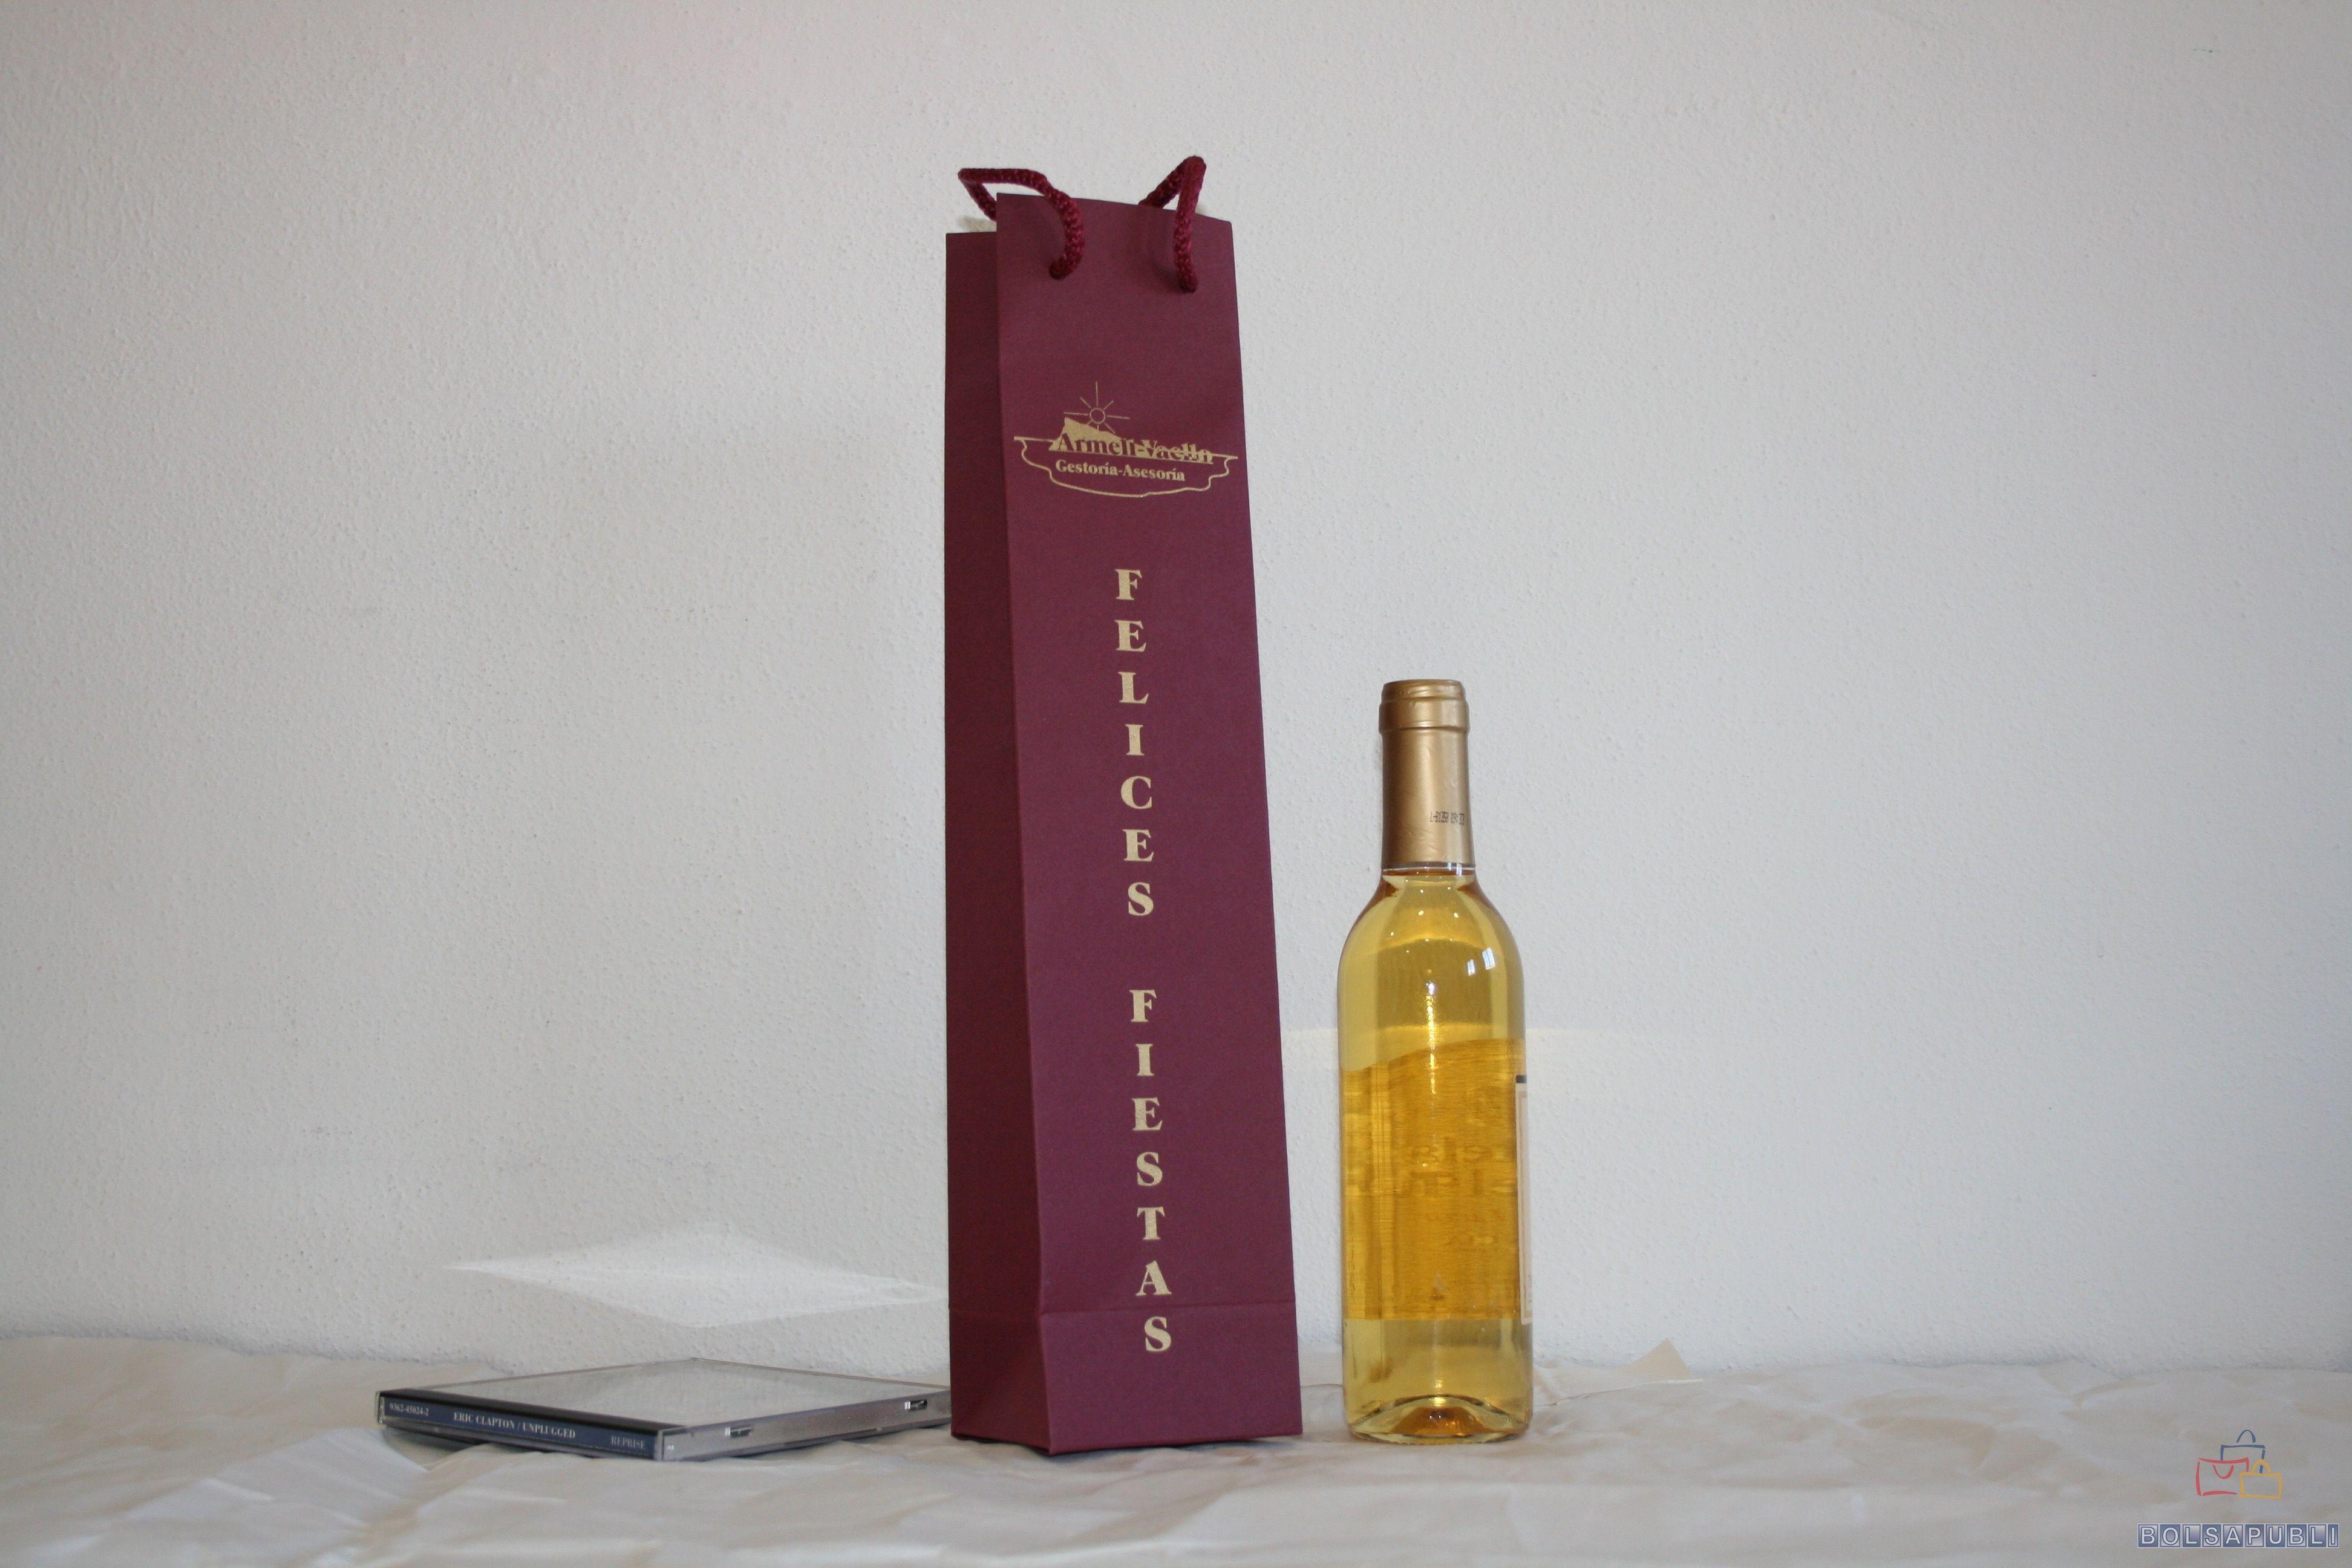 Bolsas de papel impresas para botella de vino